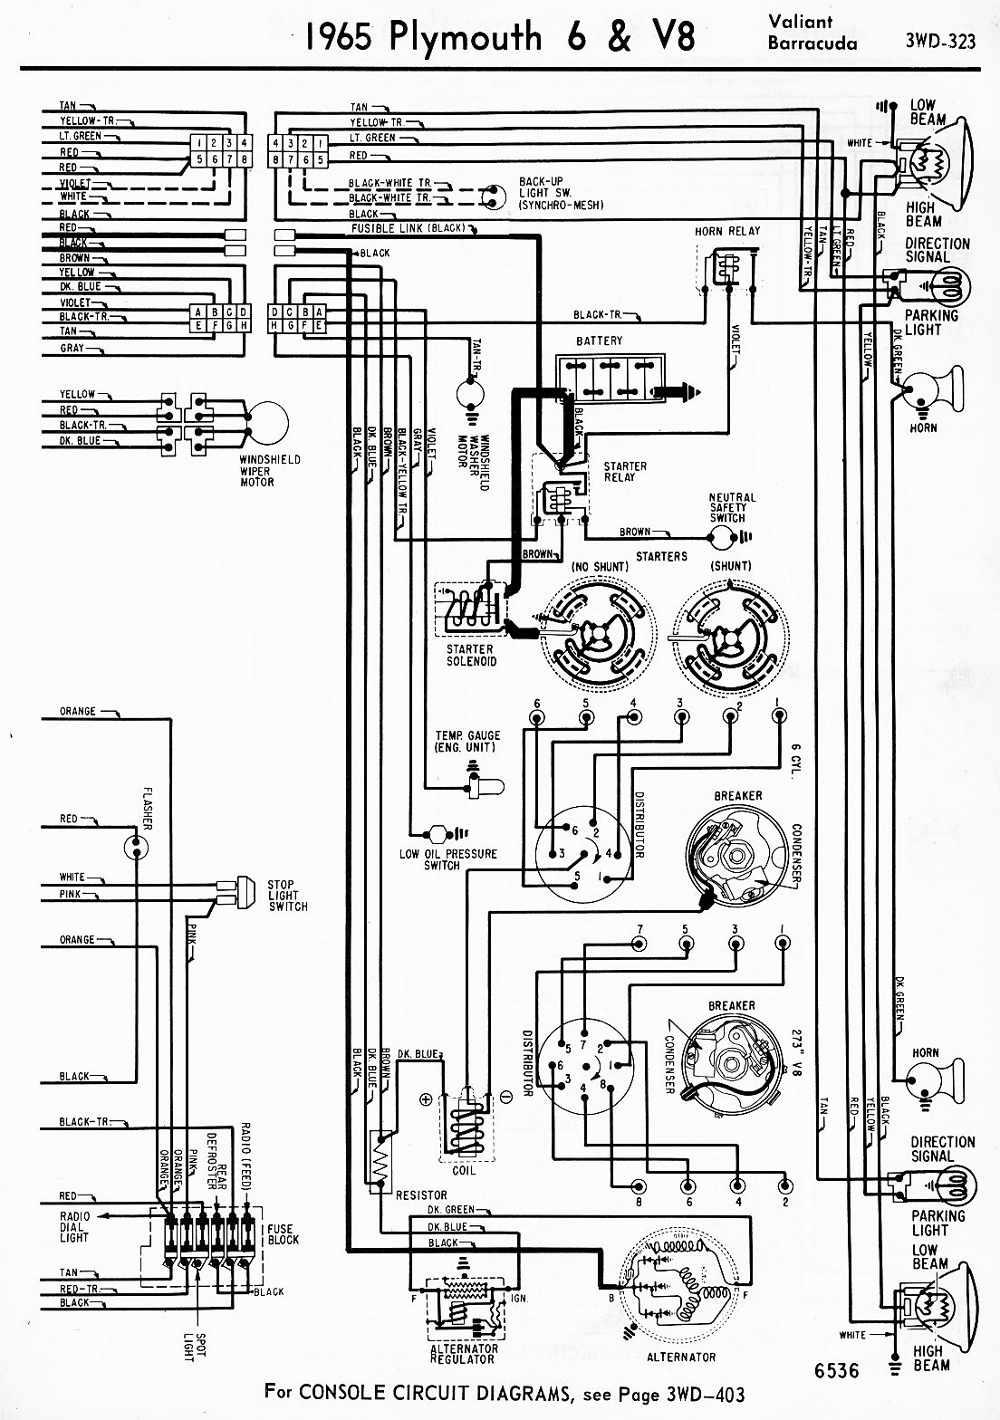 Wiring Diagram For 1965 Plymouth - Wiring Diagram 1979 Mg Midget for Wiring  Diagram Schematics | 1965 Plymouth Wiring Diagram |  | Encor Termotecnica